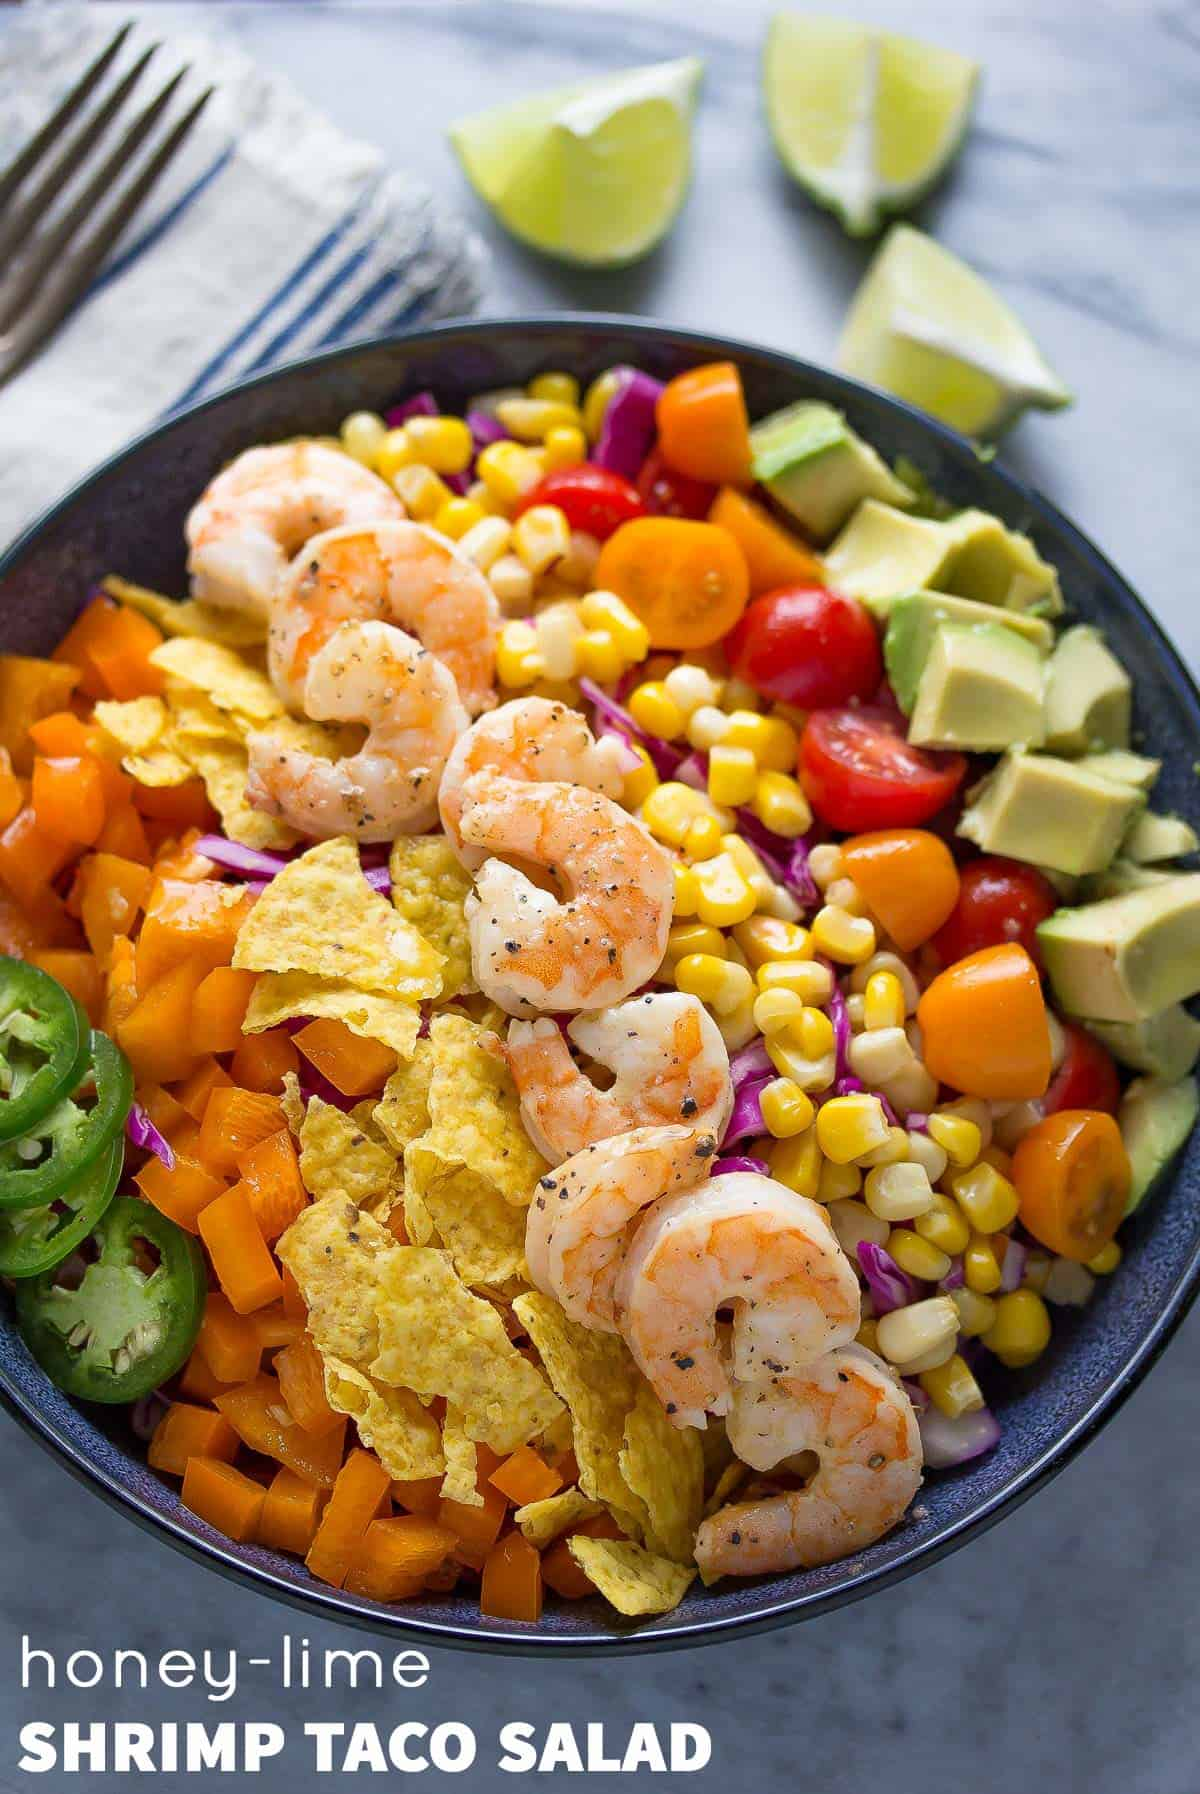 Honey-Lime Shrimp Taco Salad (20 Minutes)